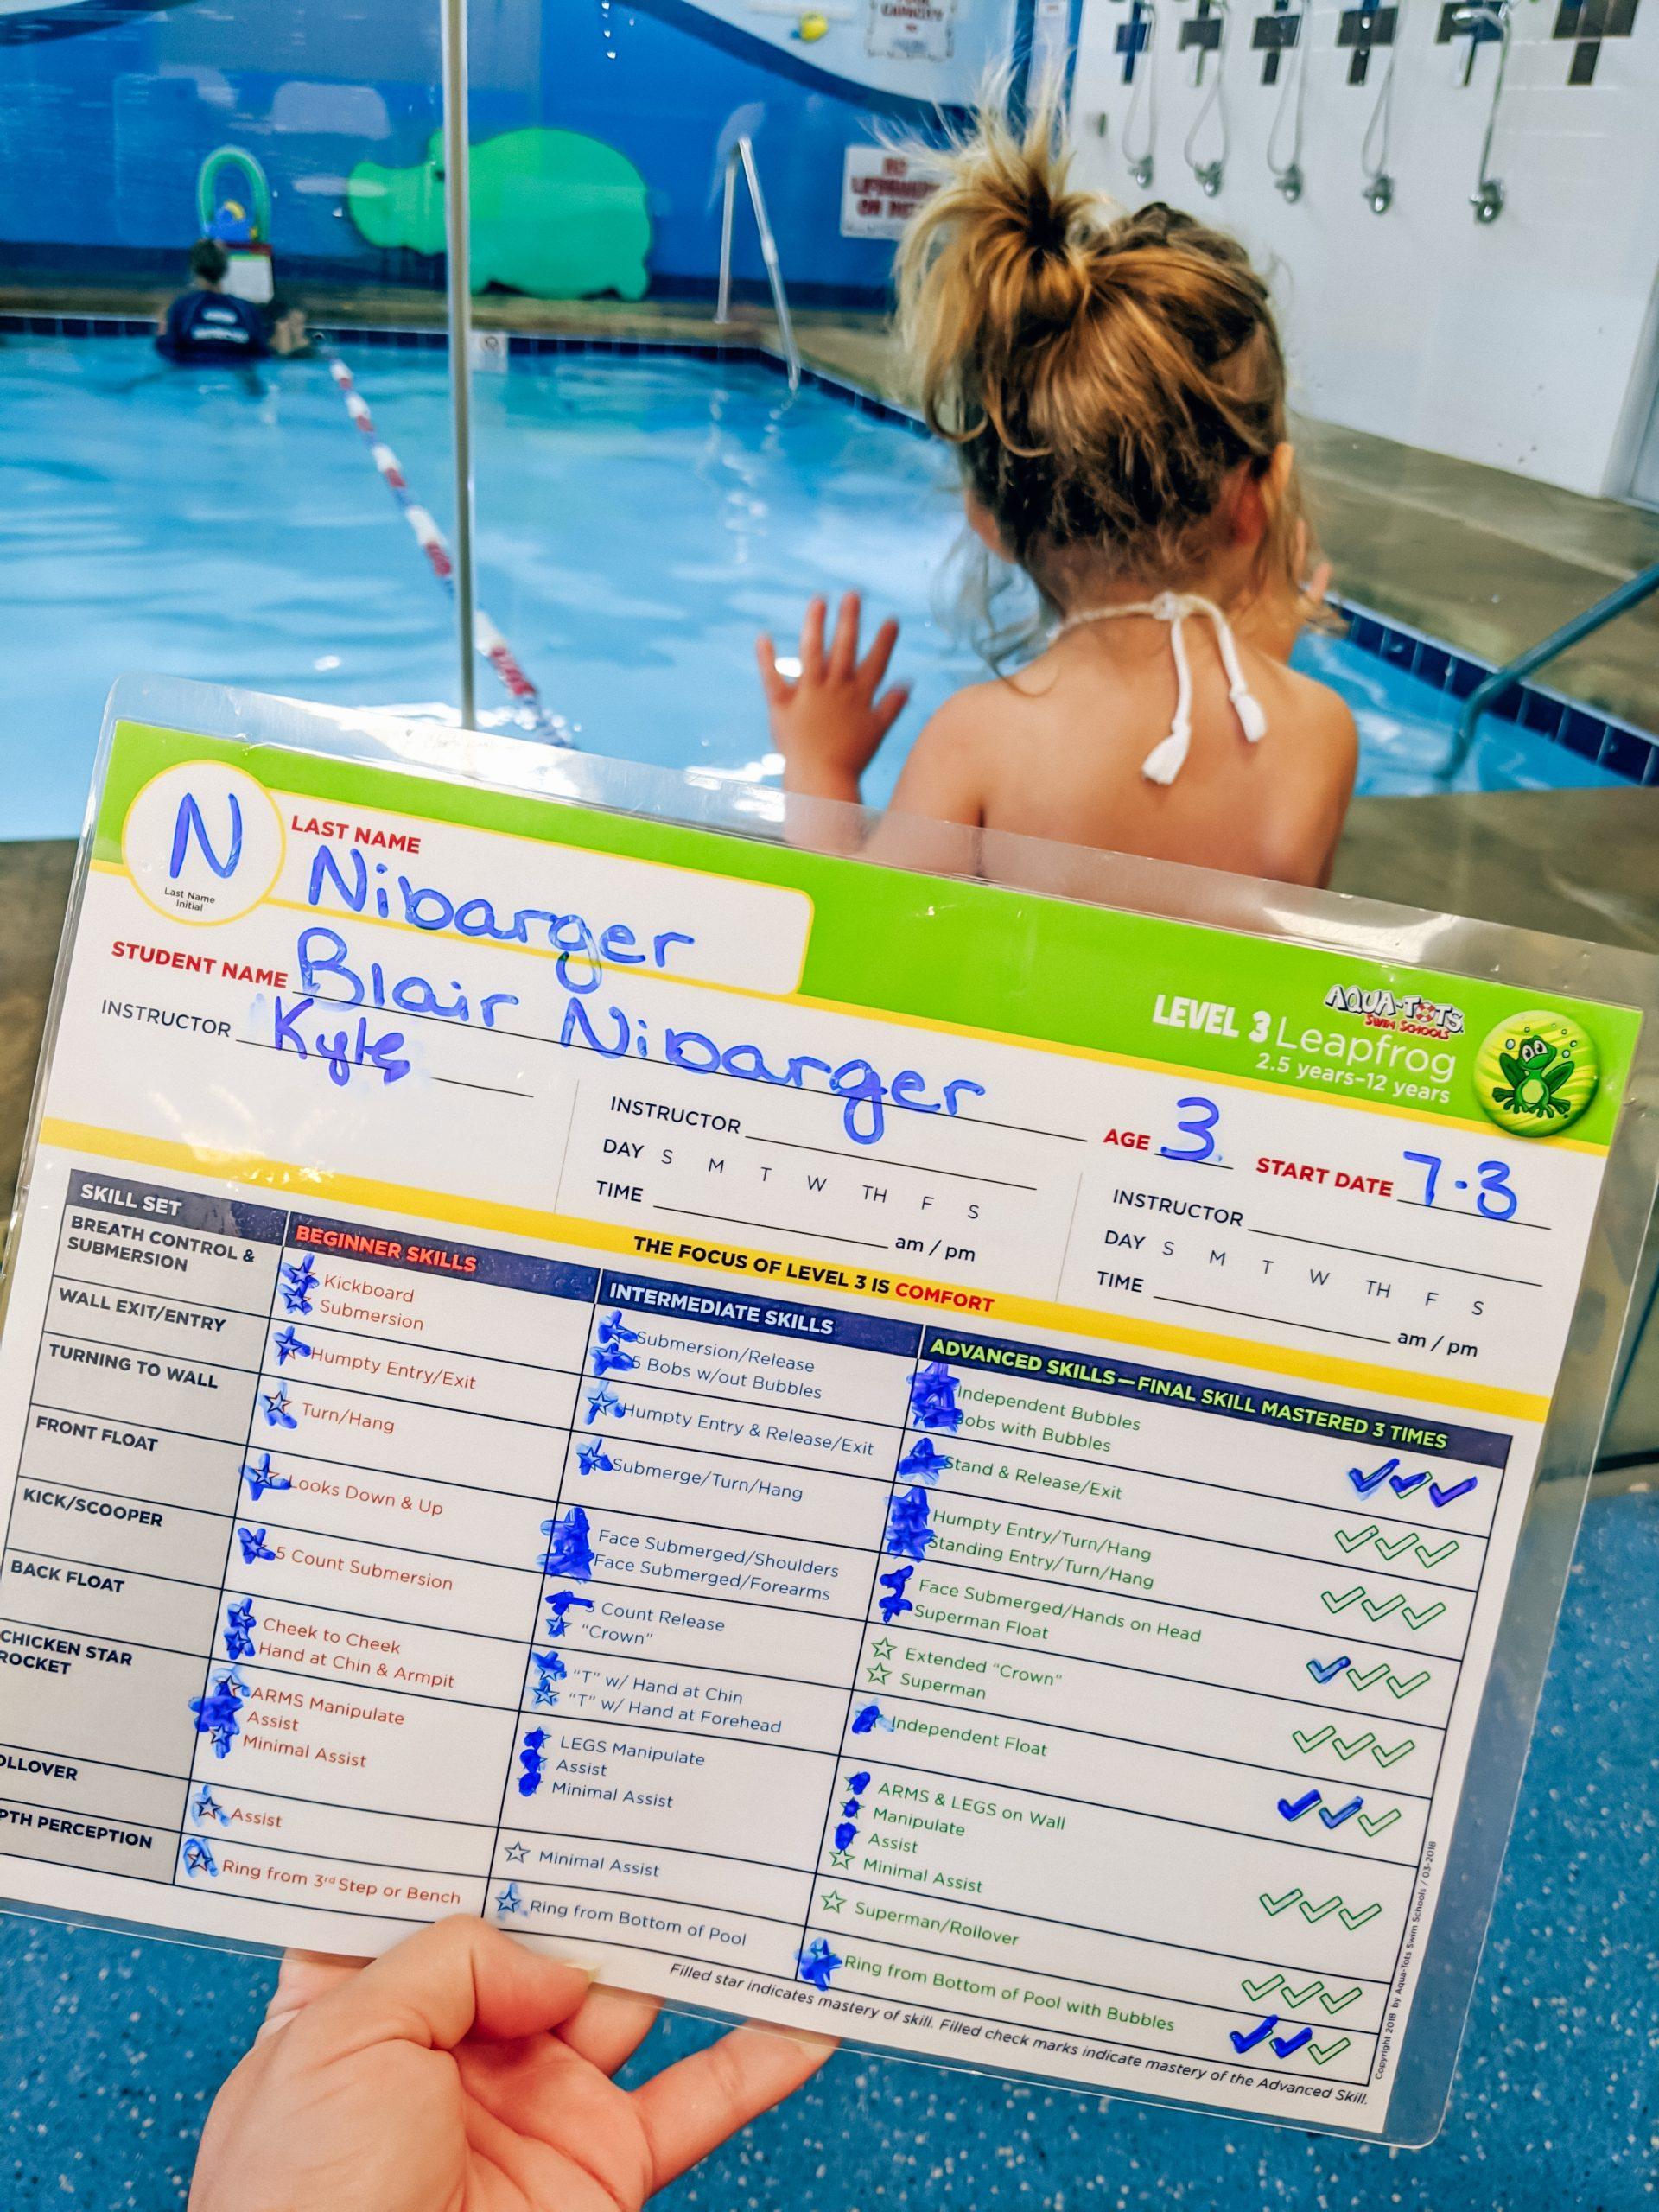 Benefits of Swimming for Kids 2020 - Benefits of Swim Lessons for Kids - Swim lessons Kansas City, Aqua-Tots Swim Schools Olathe KS